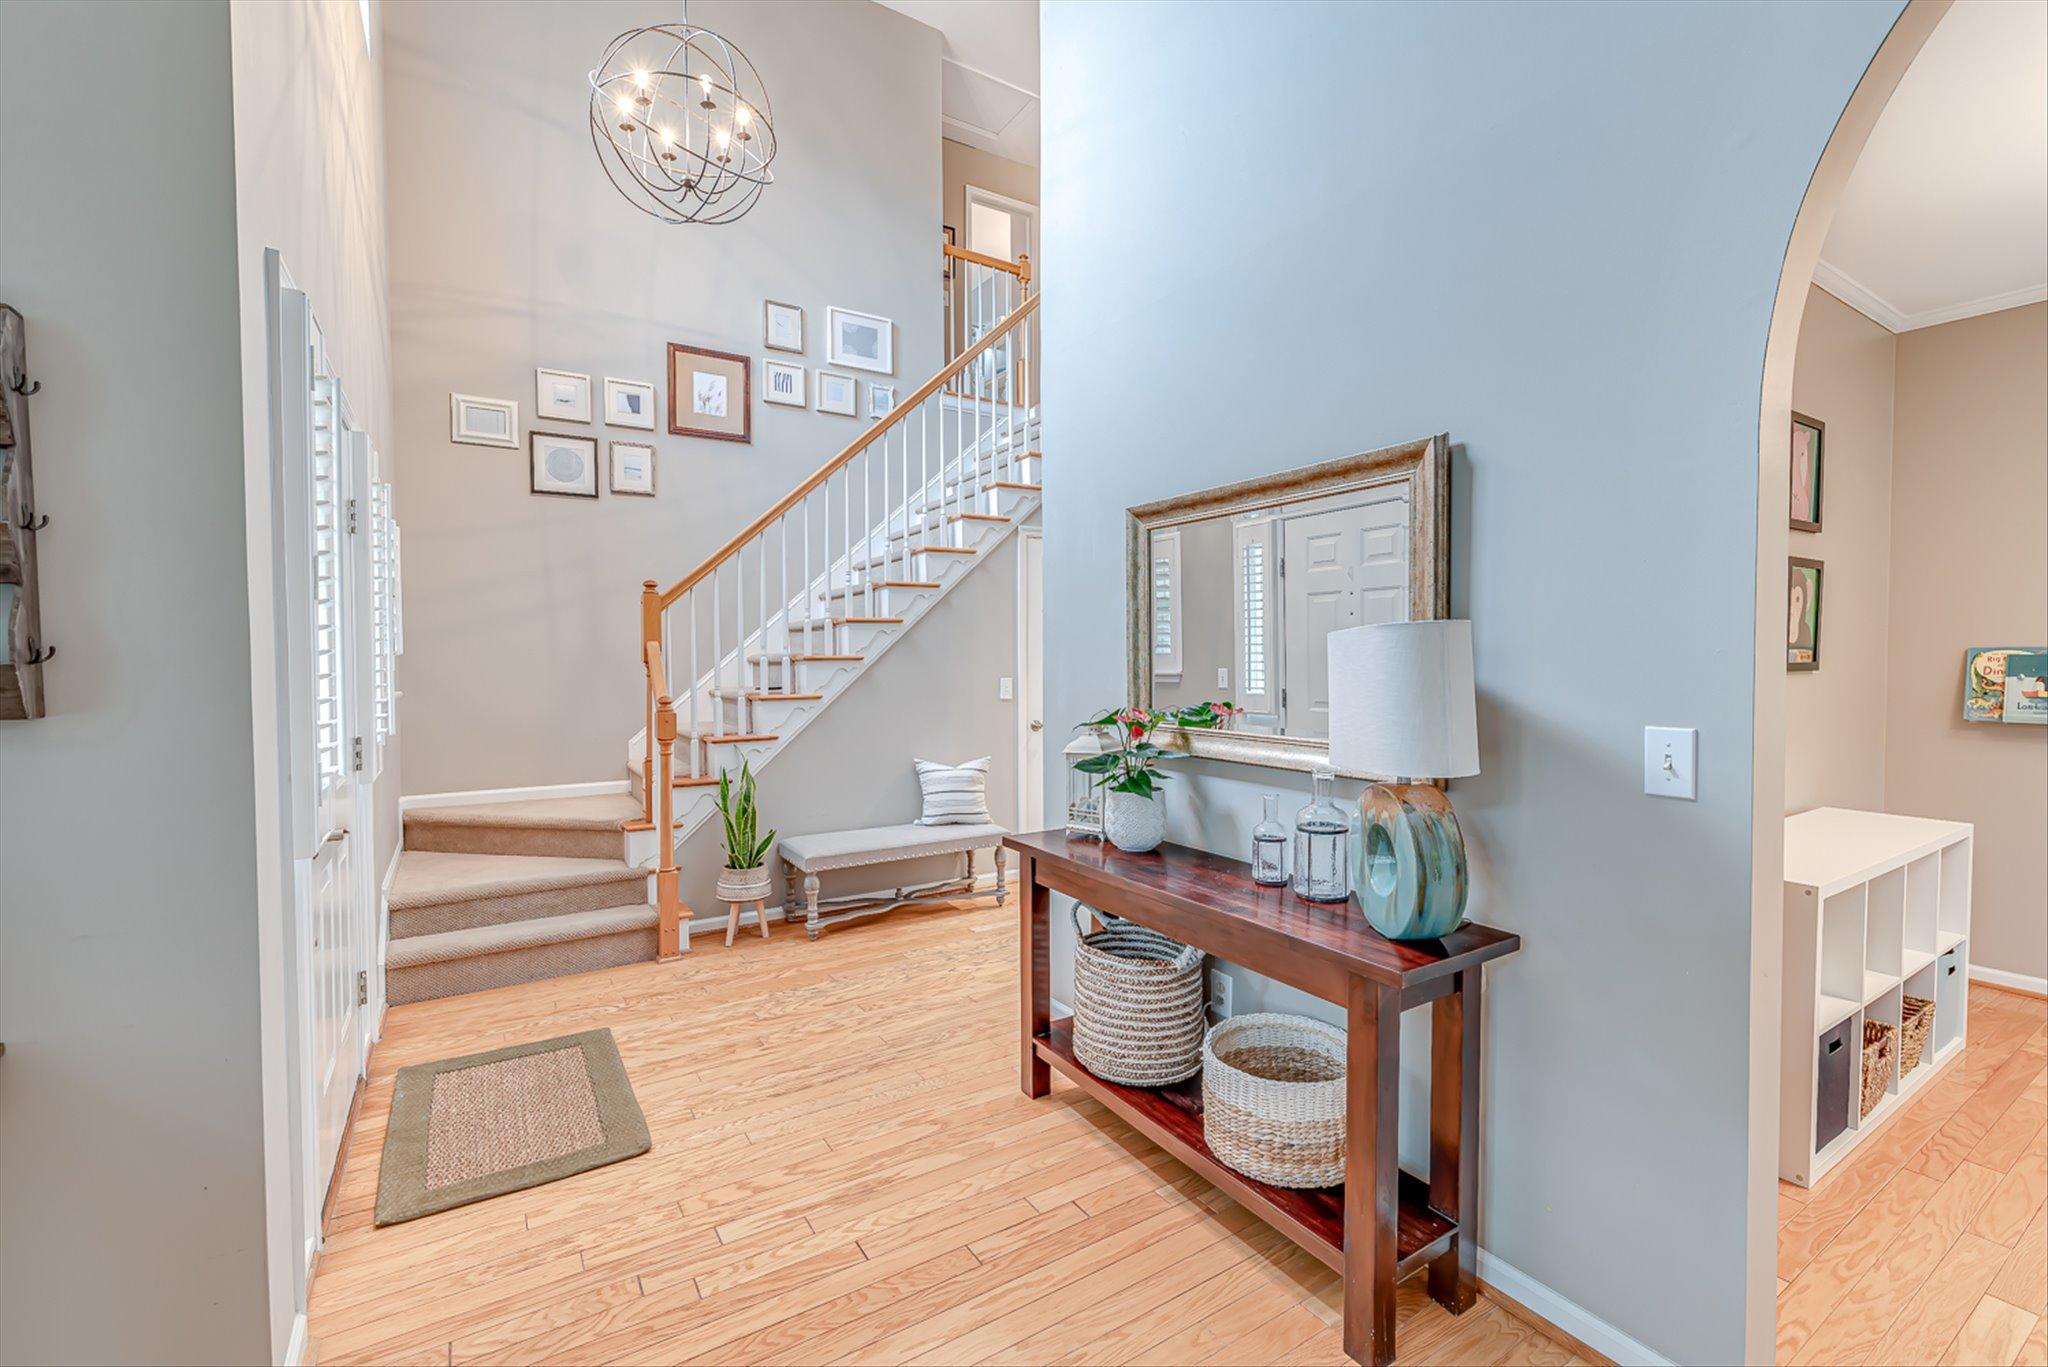 Belle Hall Homes For Sale - 278 Jardinere, Mount Pleasant, SC - 45